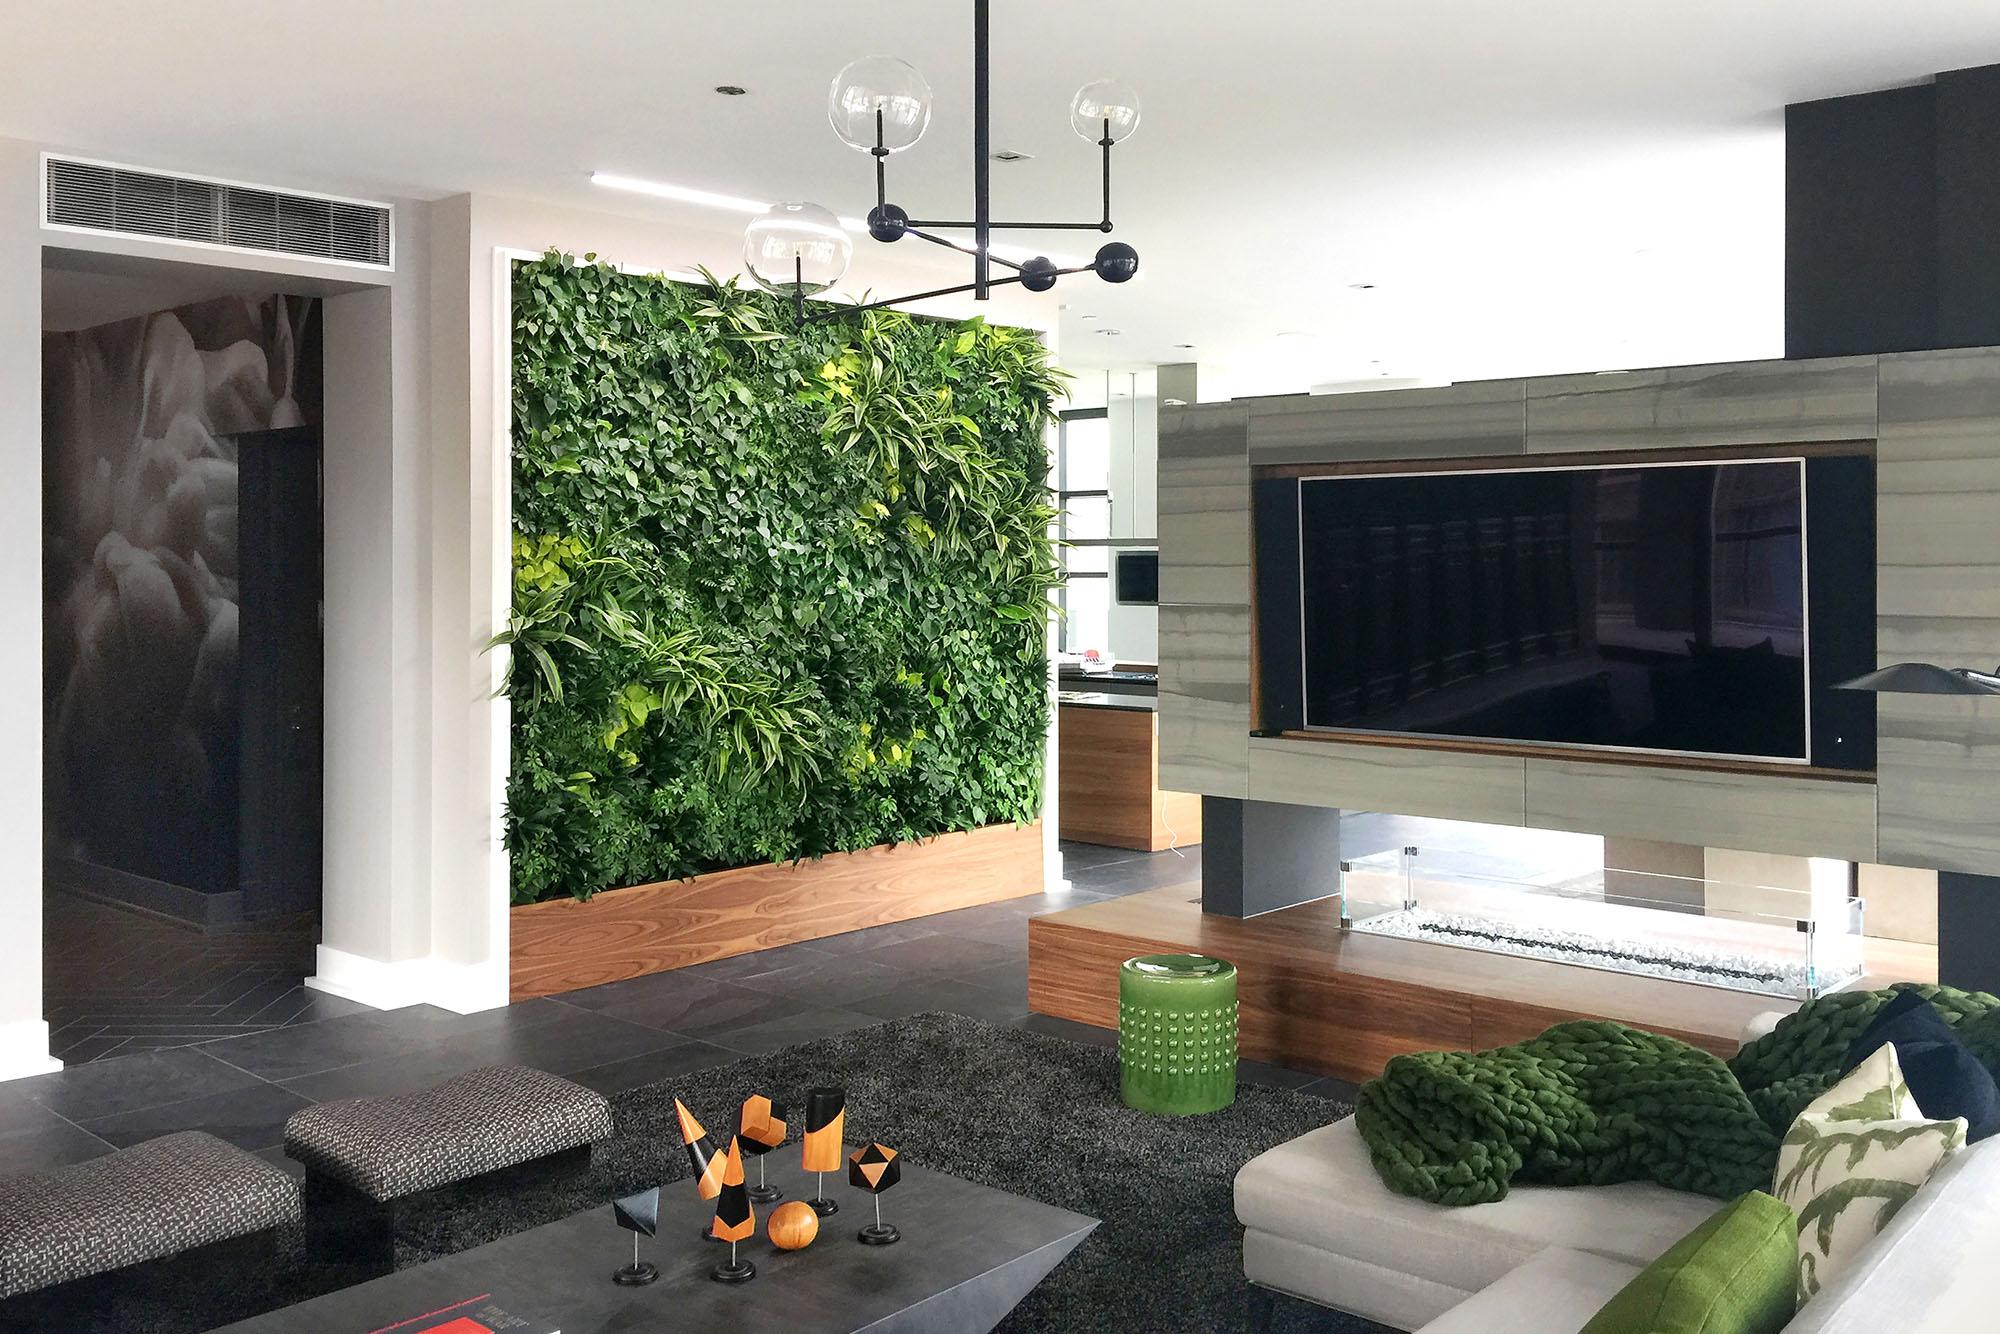 Green Eco wall art inside a modern style living room.